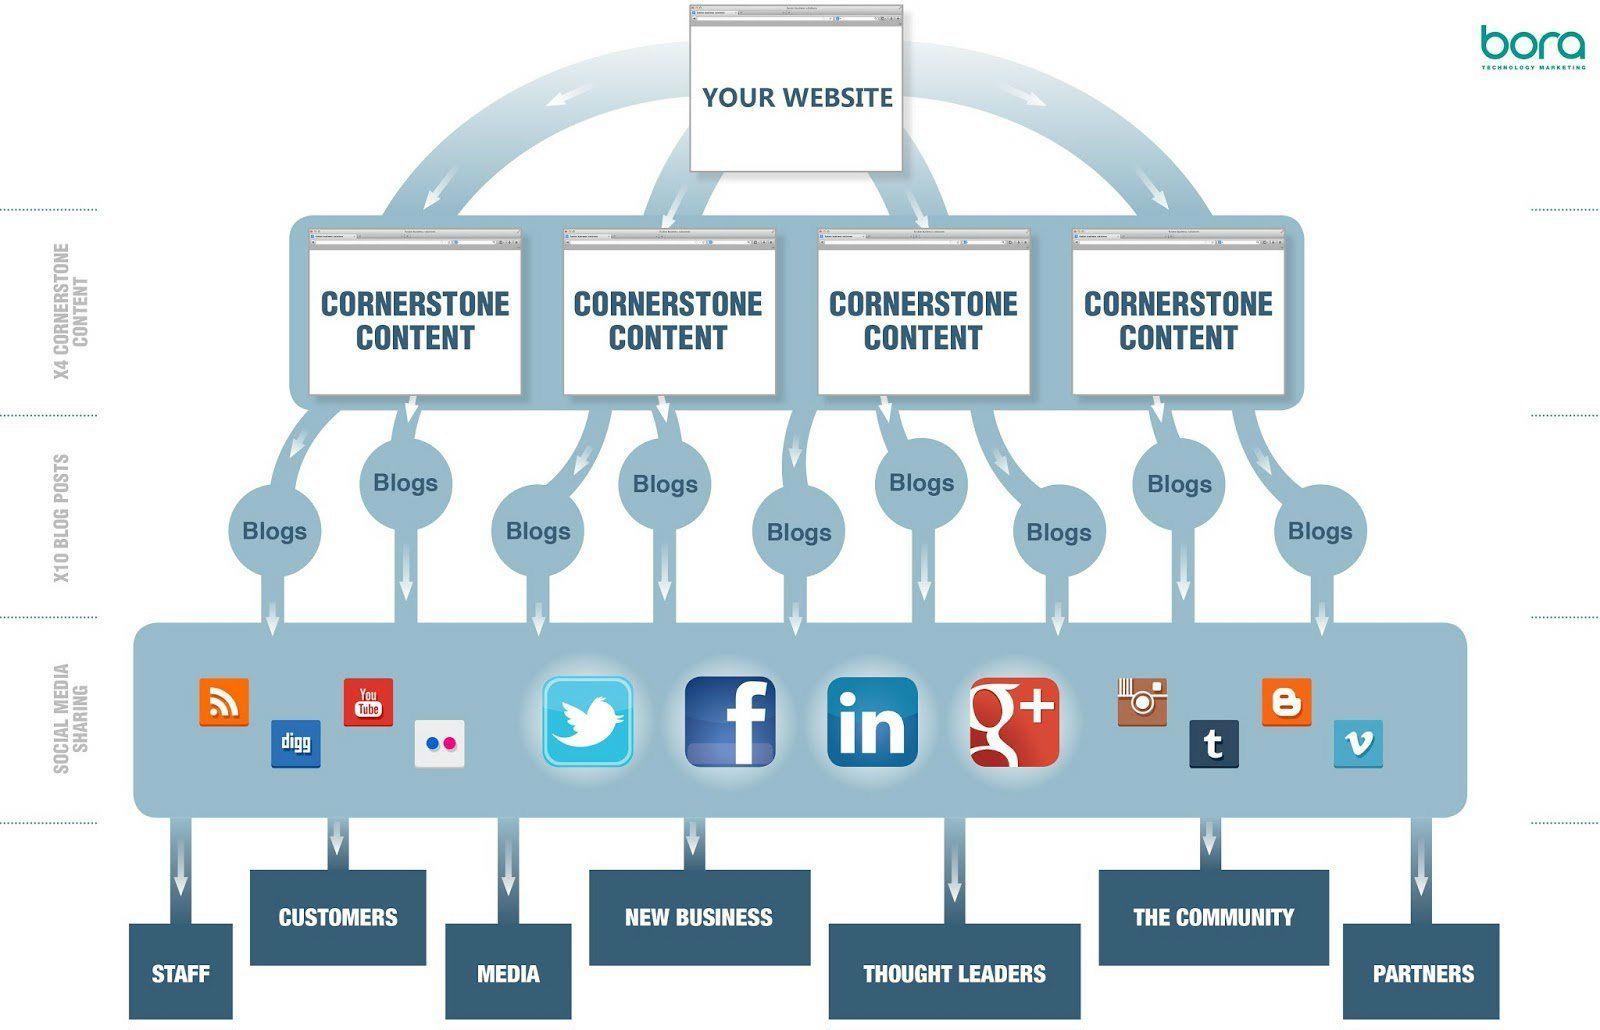 digitalmarketingcompanyinindia28329-digital-marketing